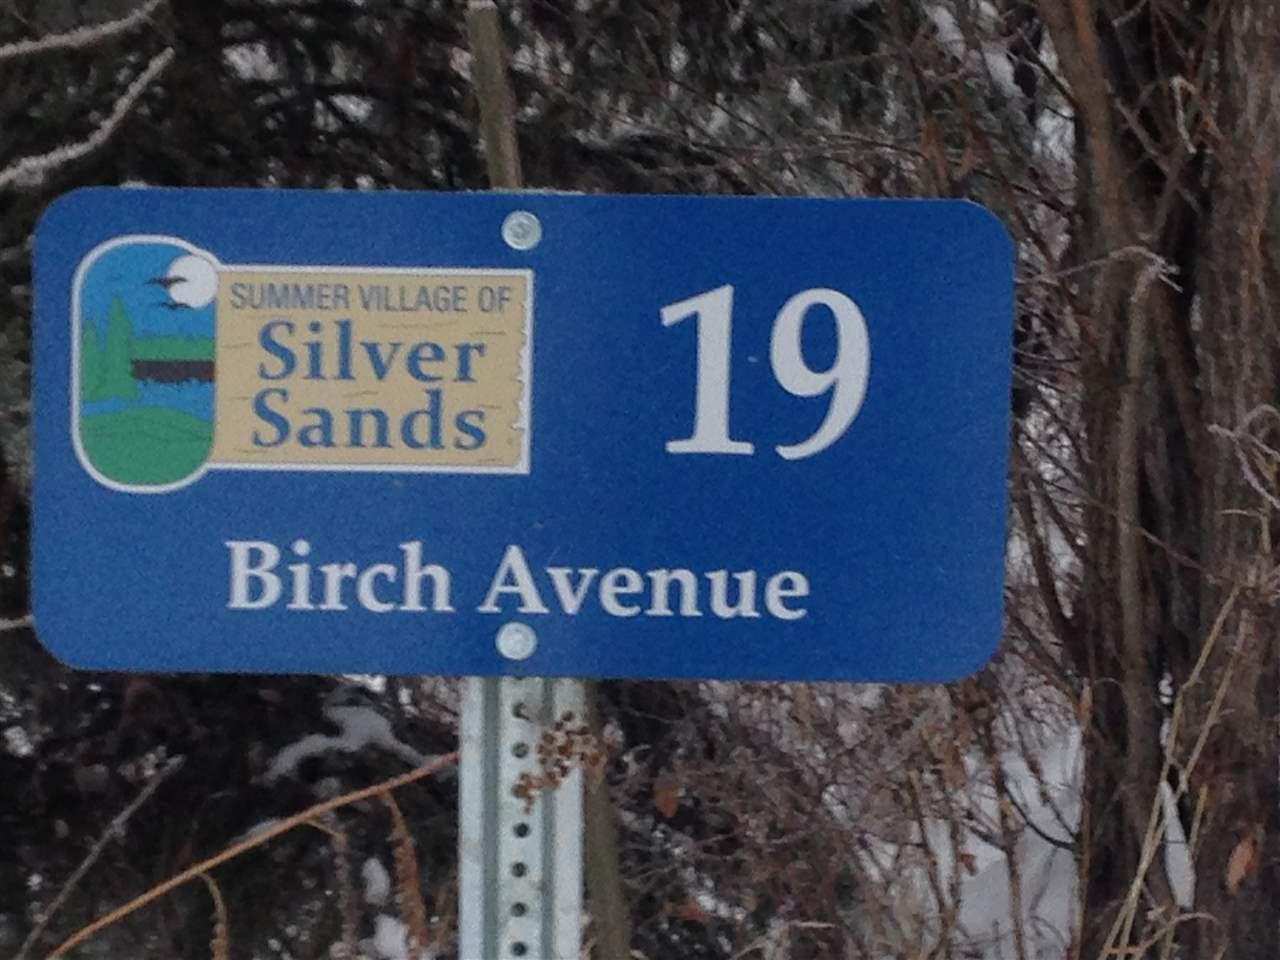 19 Birch Avenue, at $53,000